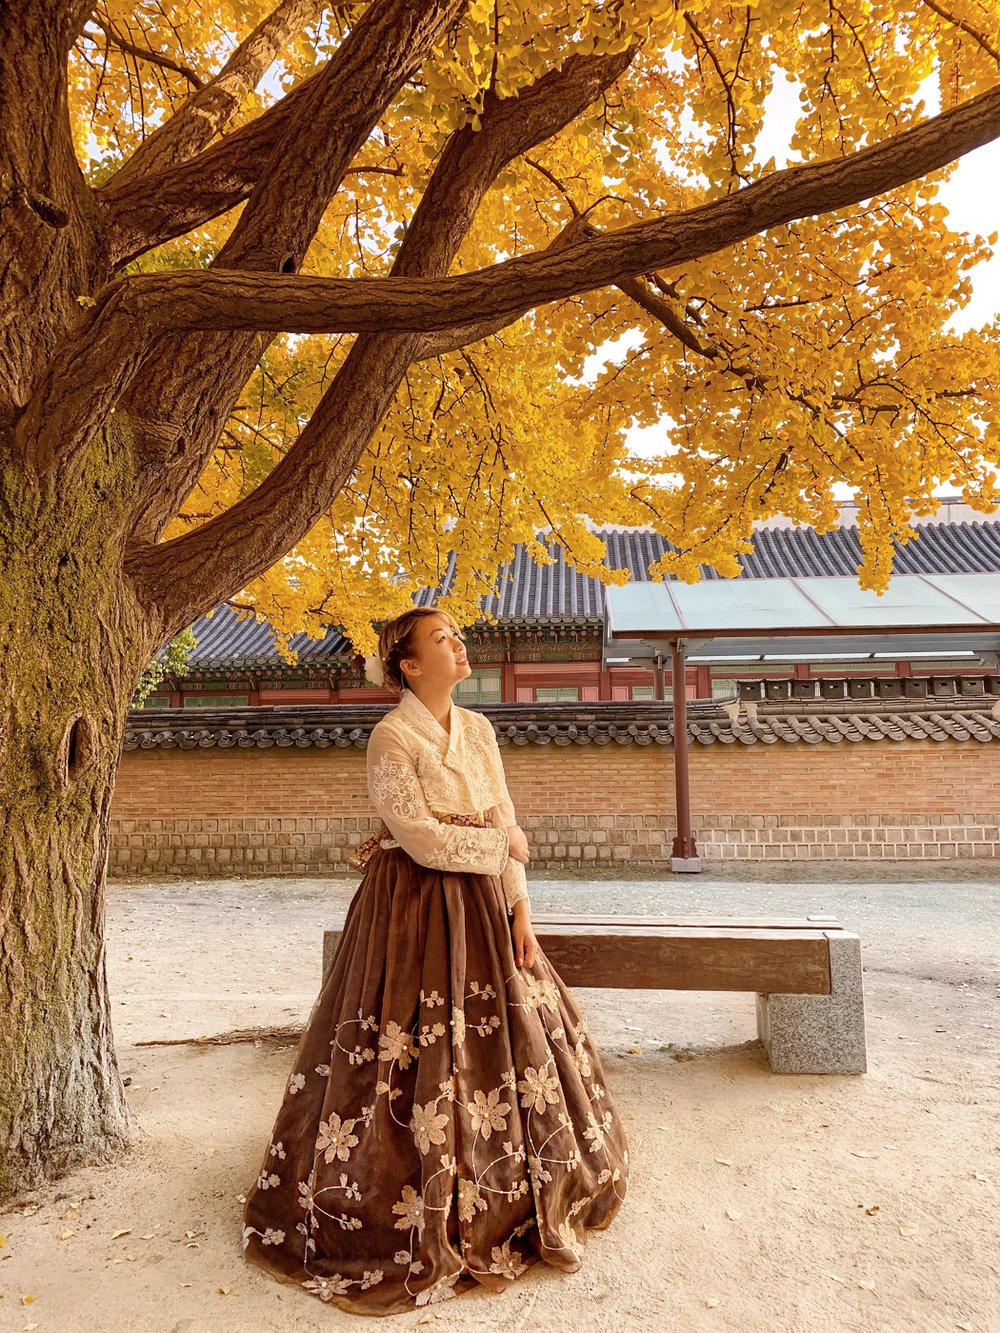 Fall in Gyeongbokgung | Seoul, Korea Travel Guide | The Chic Diary